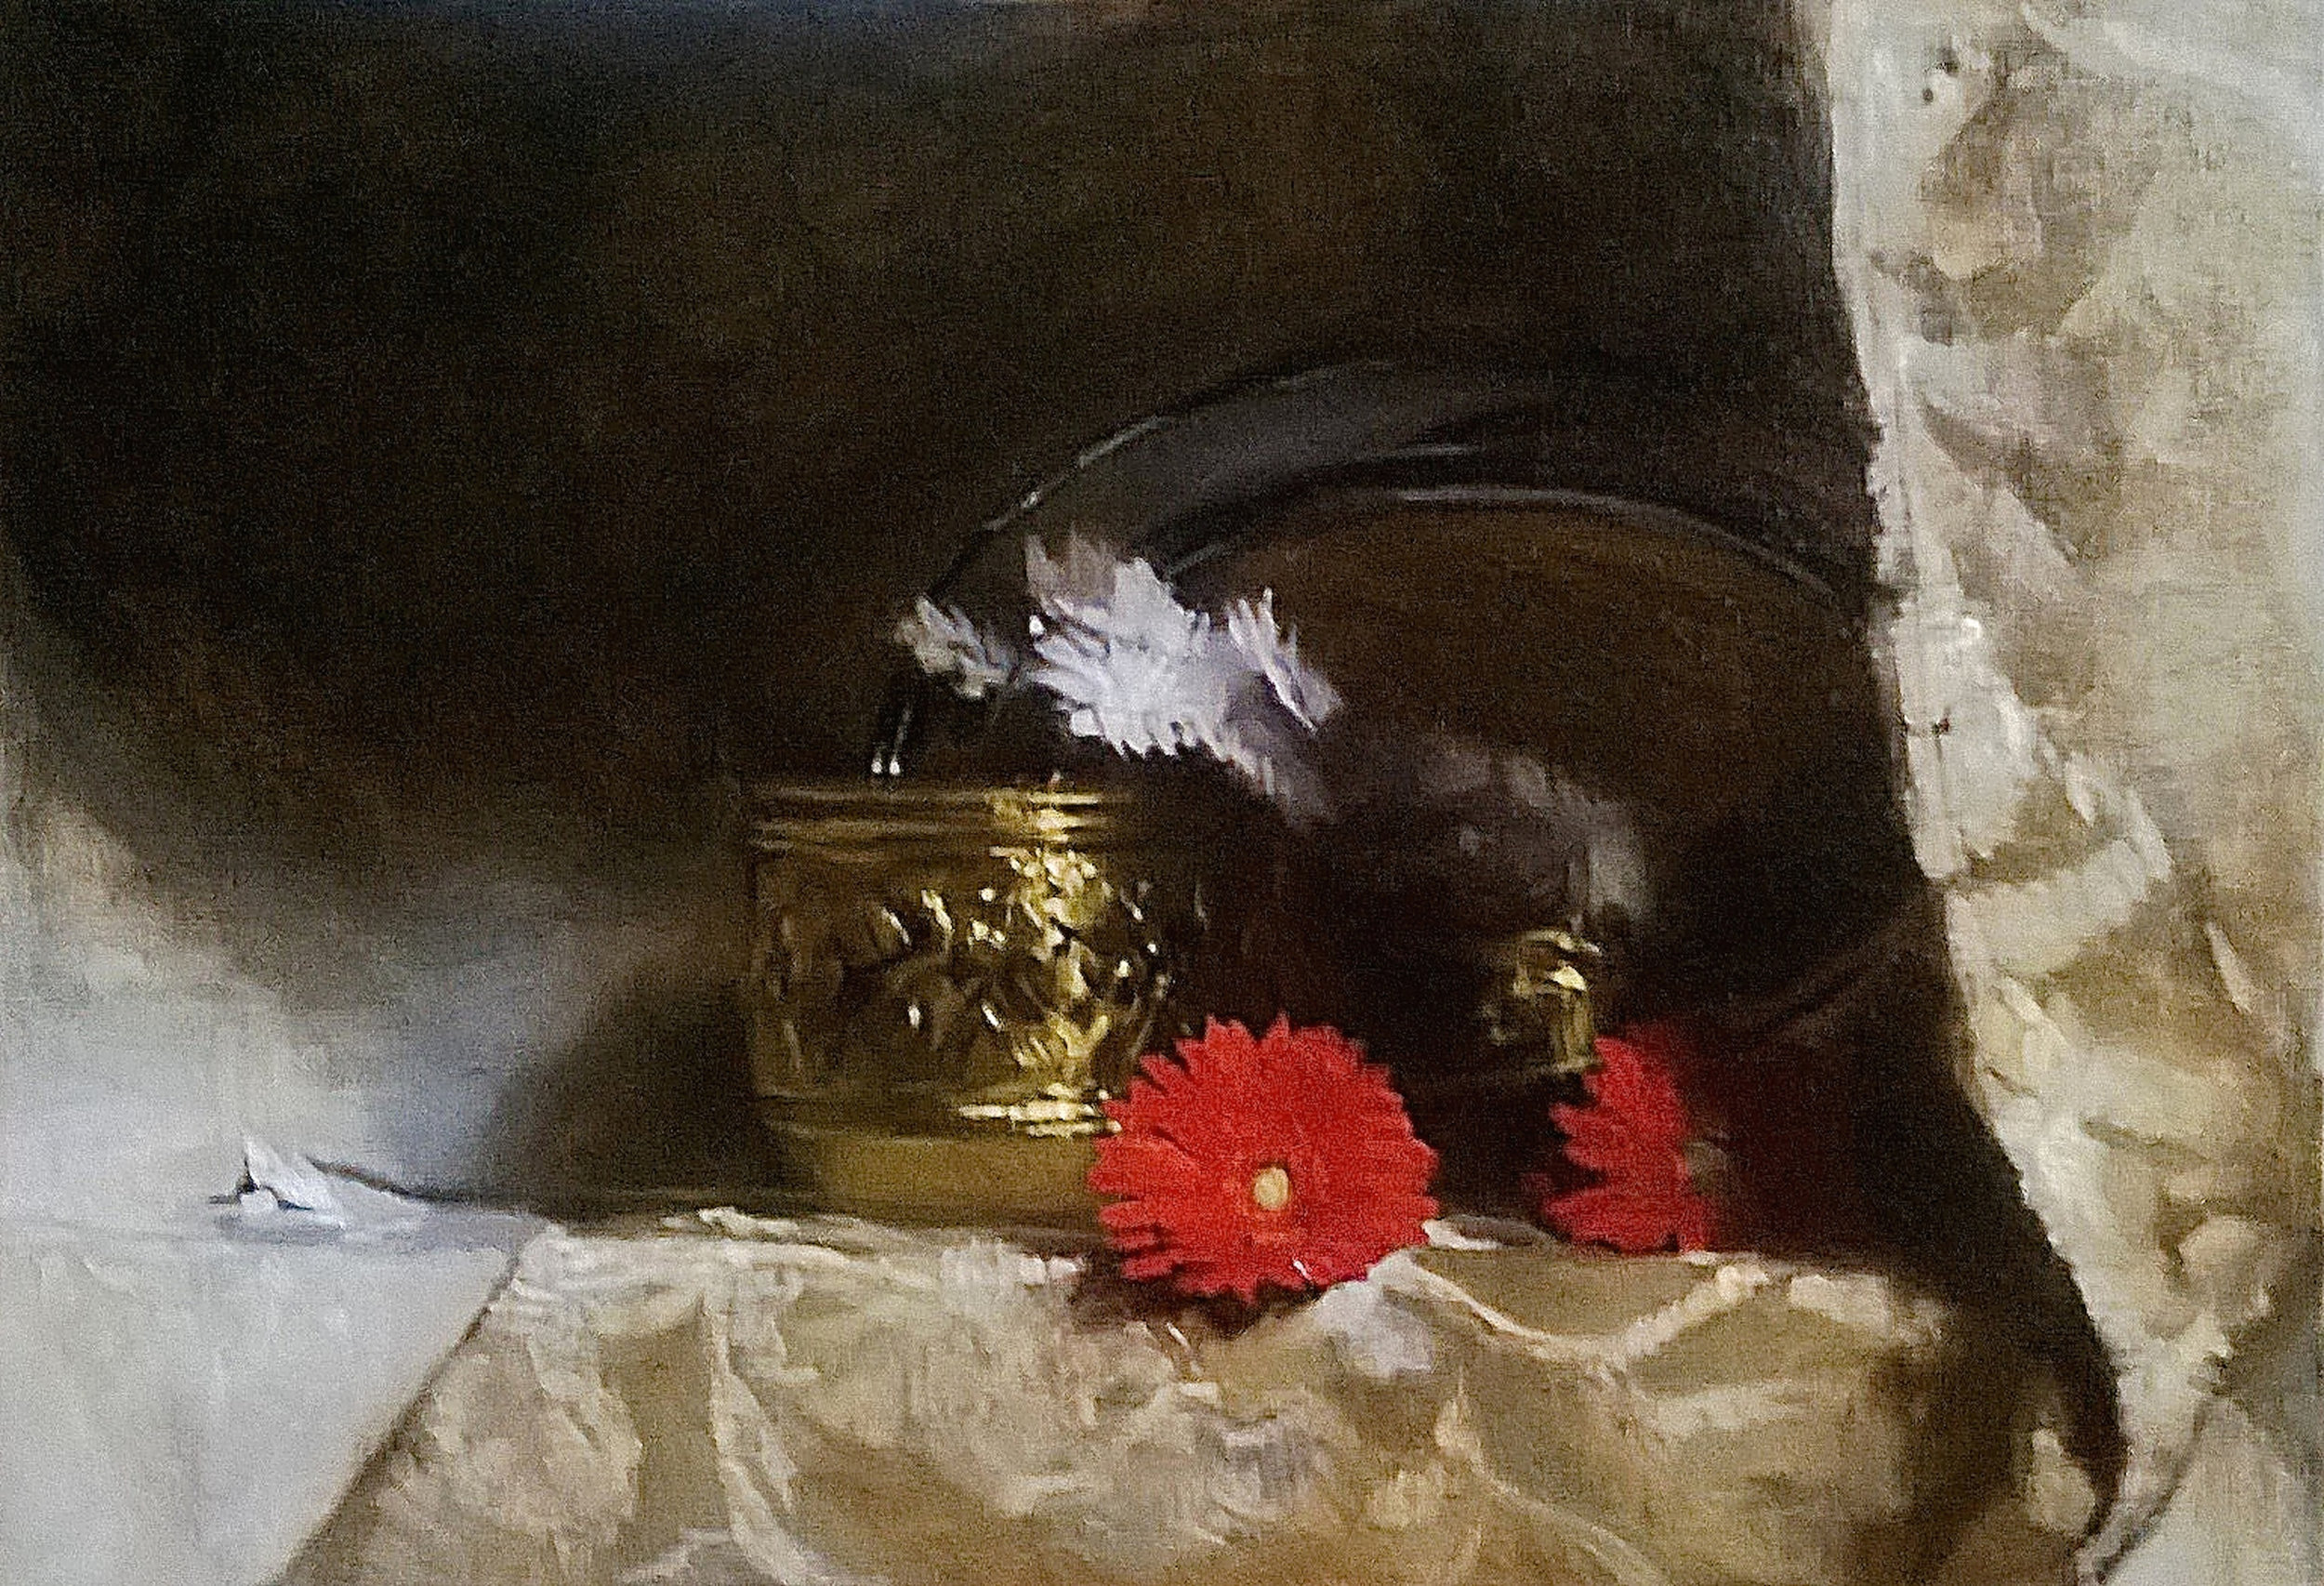 'Composition in Gold' 55 cm x 65 cm Oil on linen